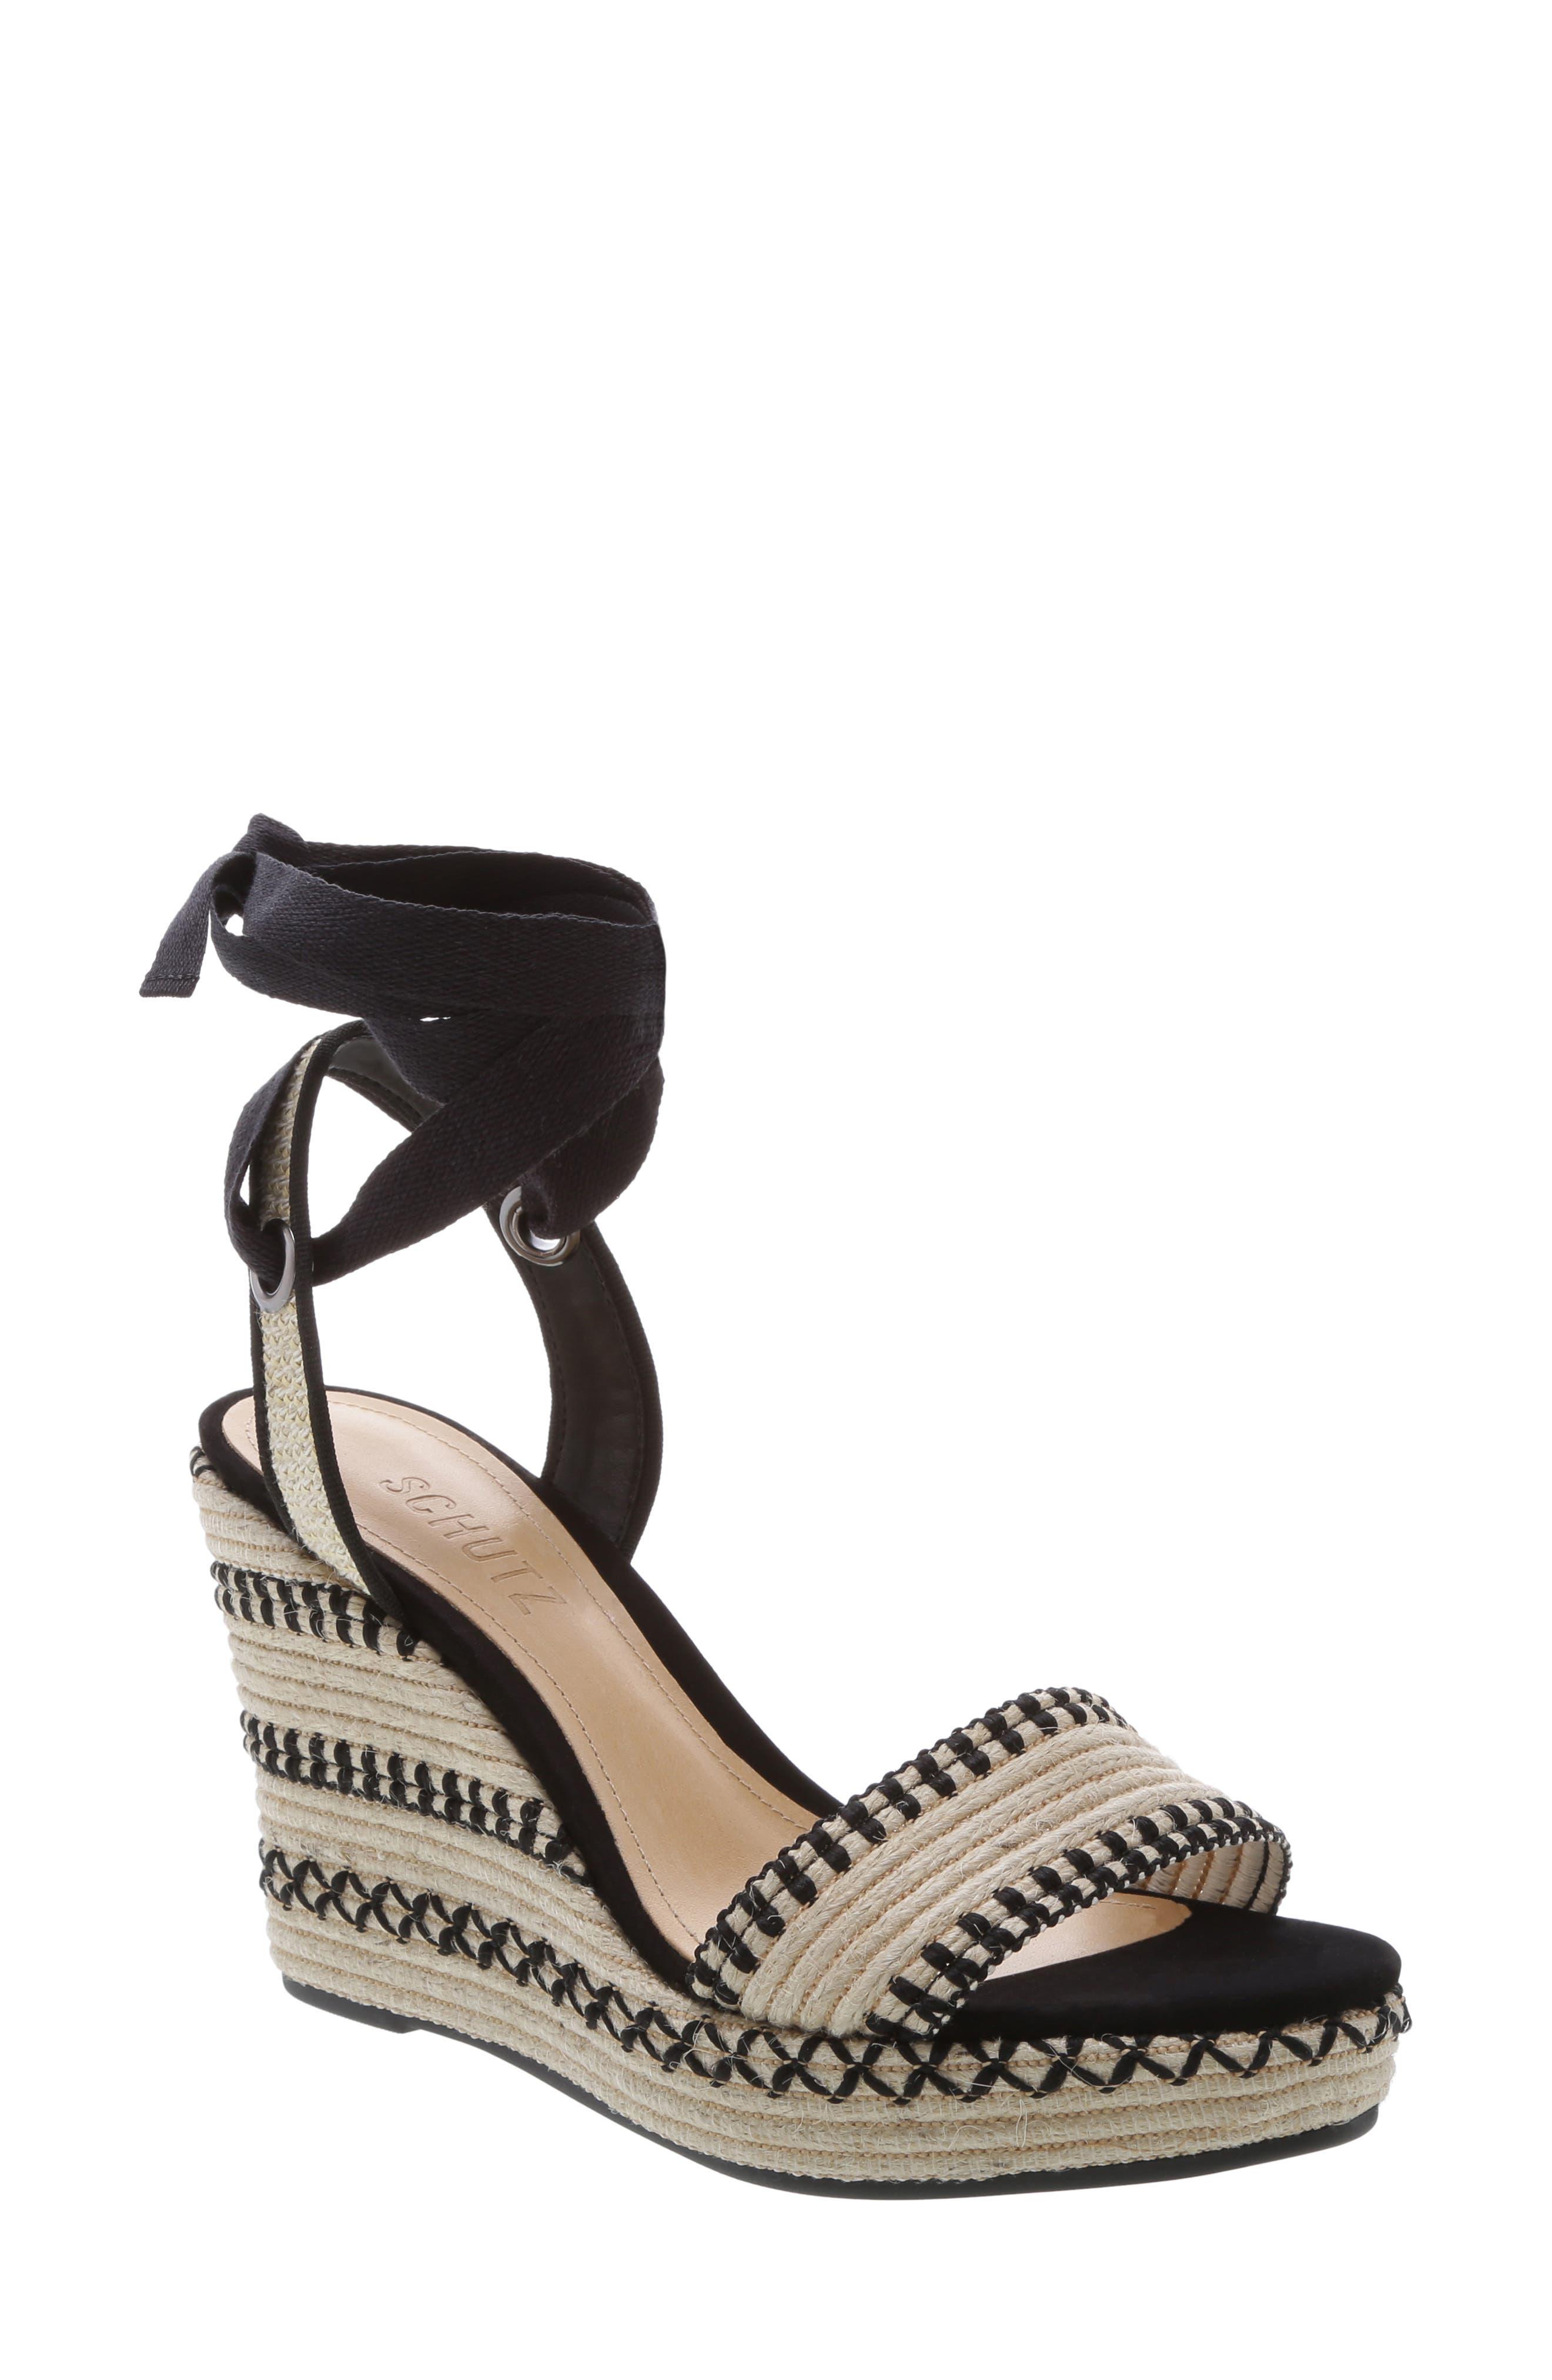 Electra Platform Wedge Sandal,                             Main thumbnail 1, color,                             NATURAL BLACK FABRIC